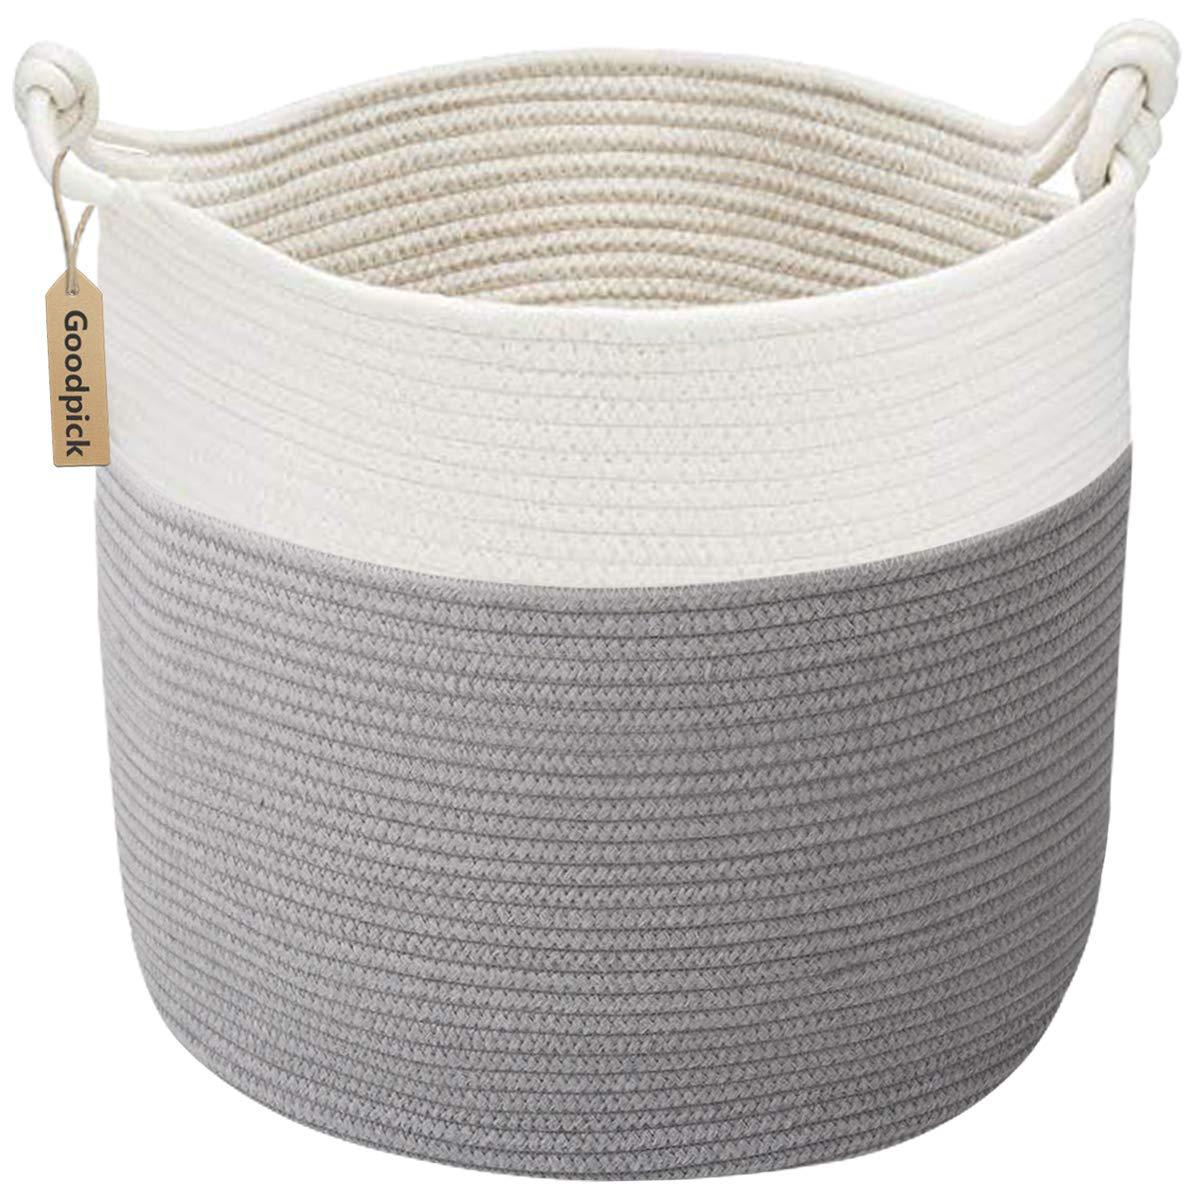 Goodpick Cotton Rope Basket with Handle for Baby Laundry Basket Toy Storage Blanket Storage Nursery Basket Soft Storage Bins-Natural Woven Basket, 15'' × 15'' × 14.2'' by Goodpick